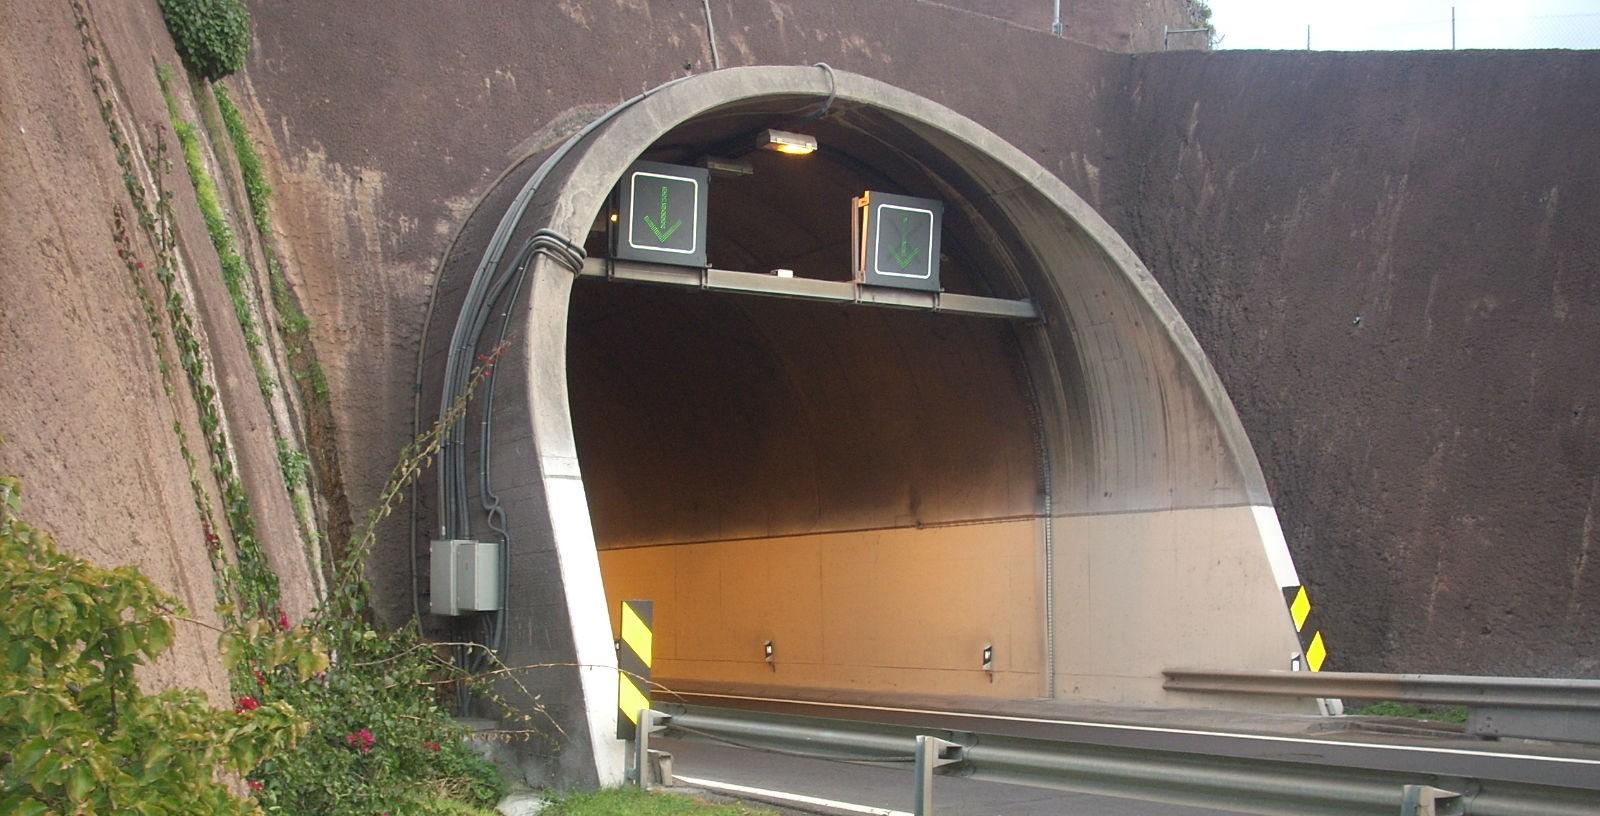 Vialitoral_ITS_Tunel_Madeira_Idom_2